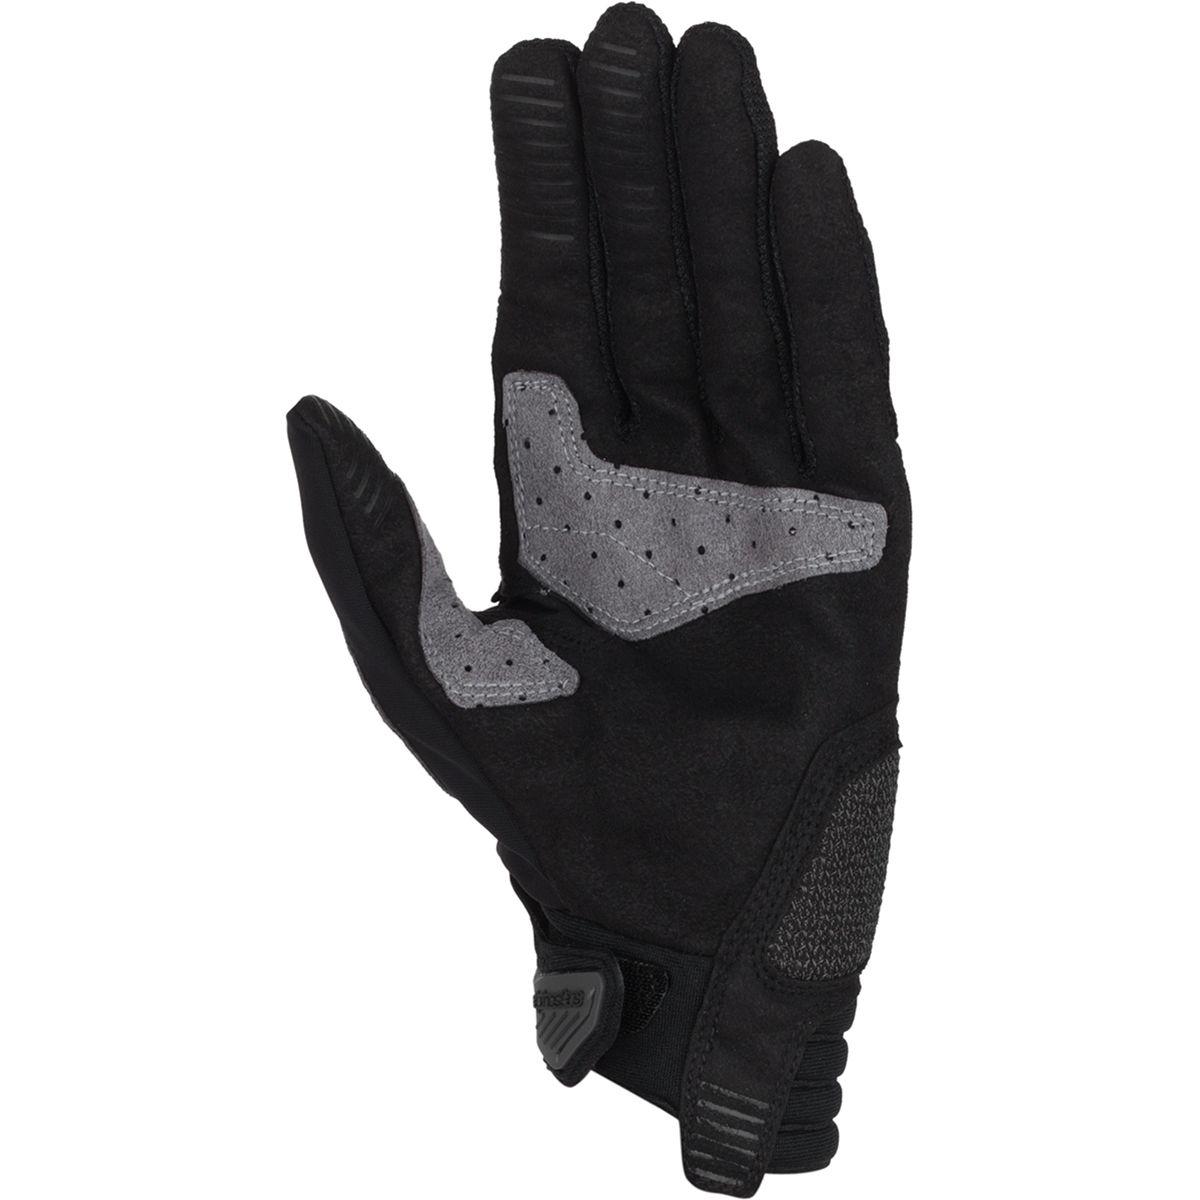 Alpinestars-Drop-Pro-Glove-Men-039-s miniature 26